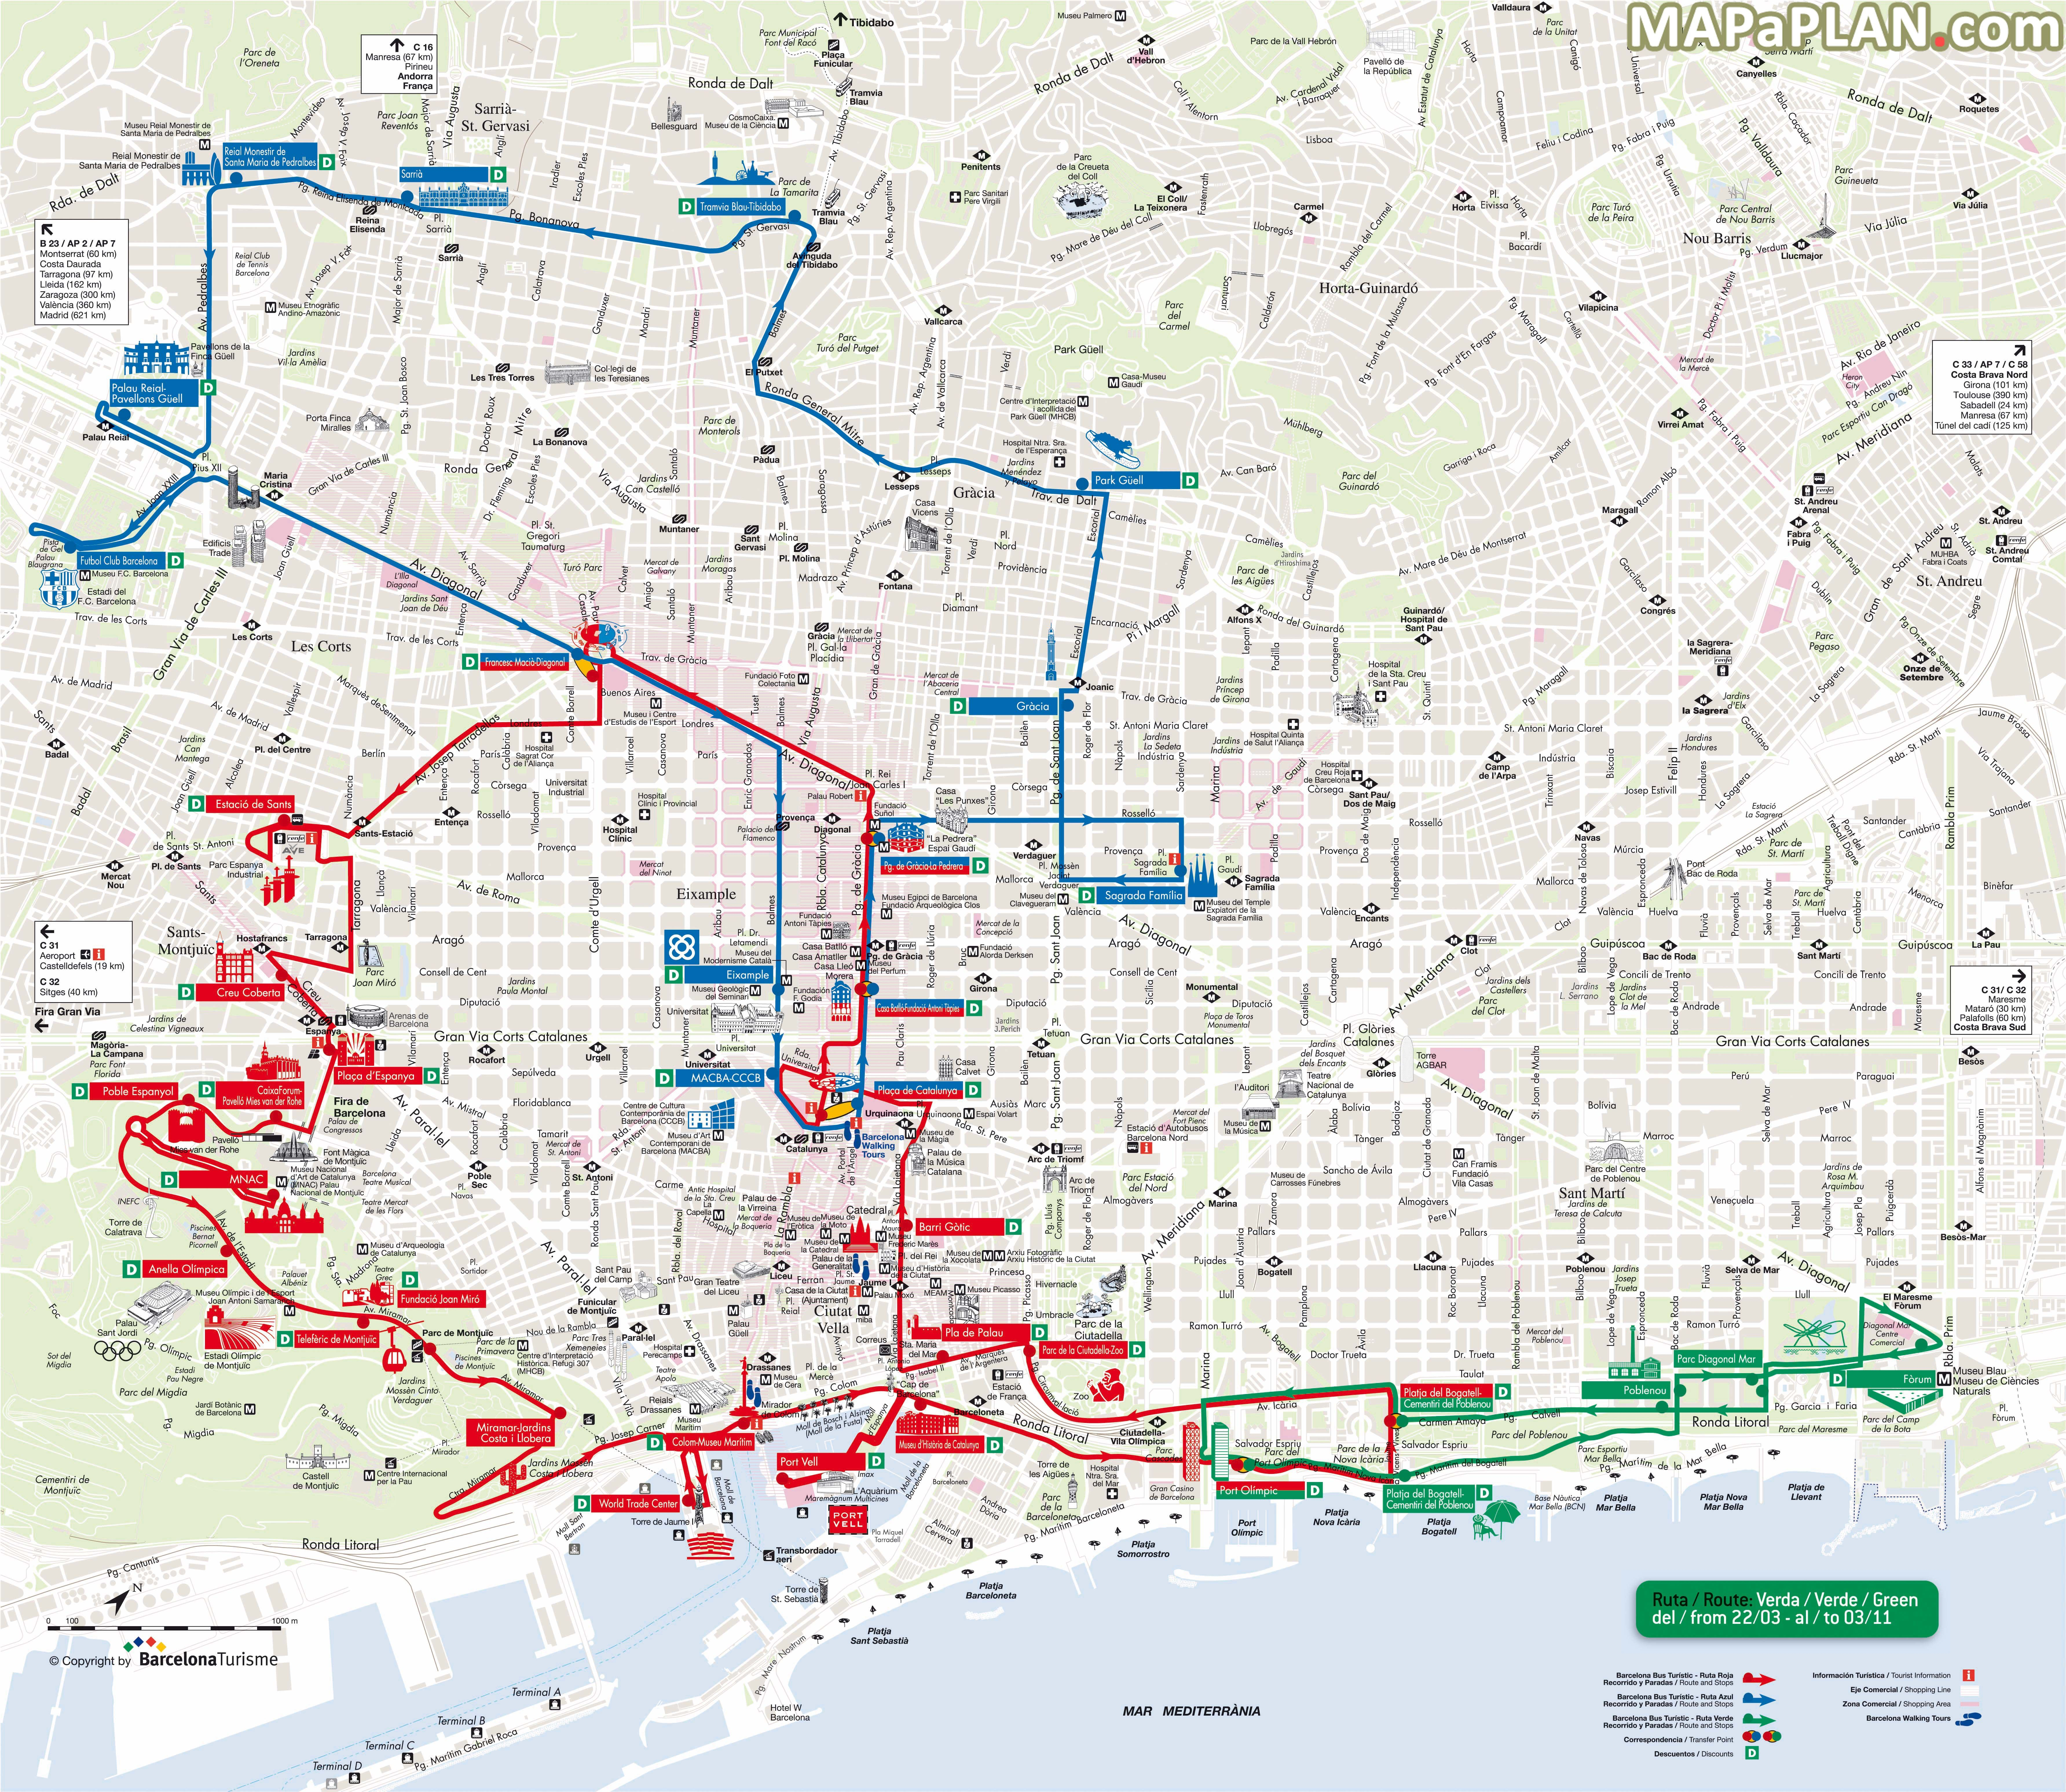 City Sightseeing hopon hopoff bus tour Red Blue Green